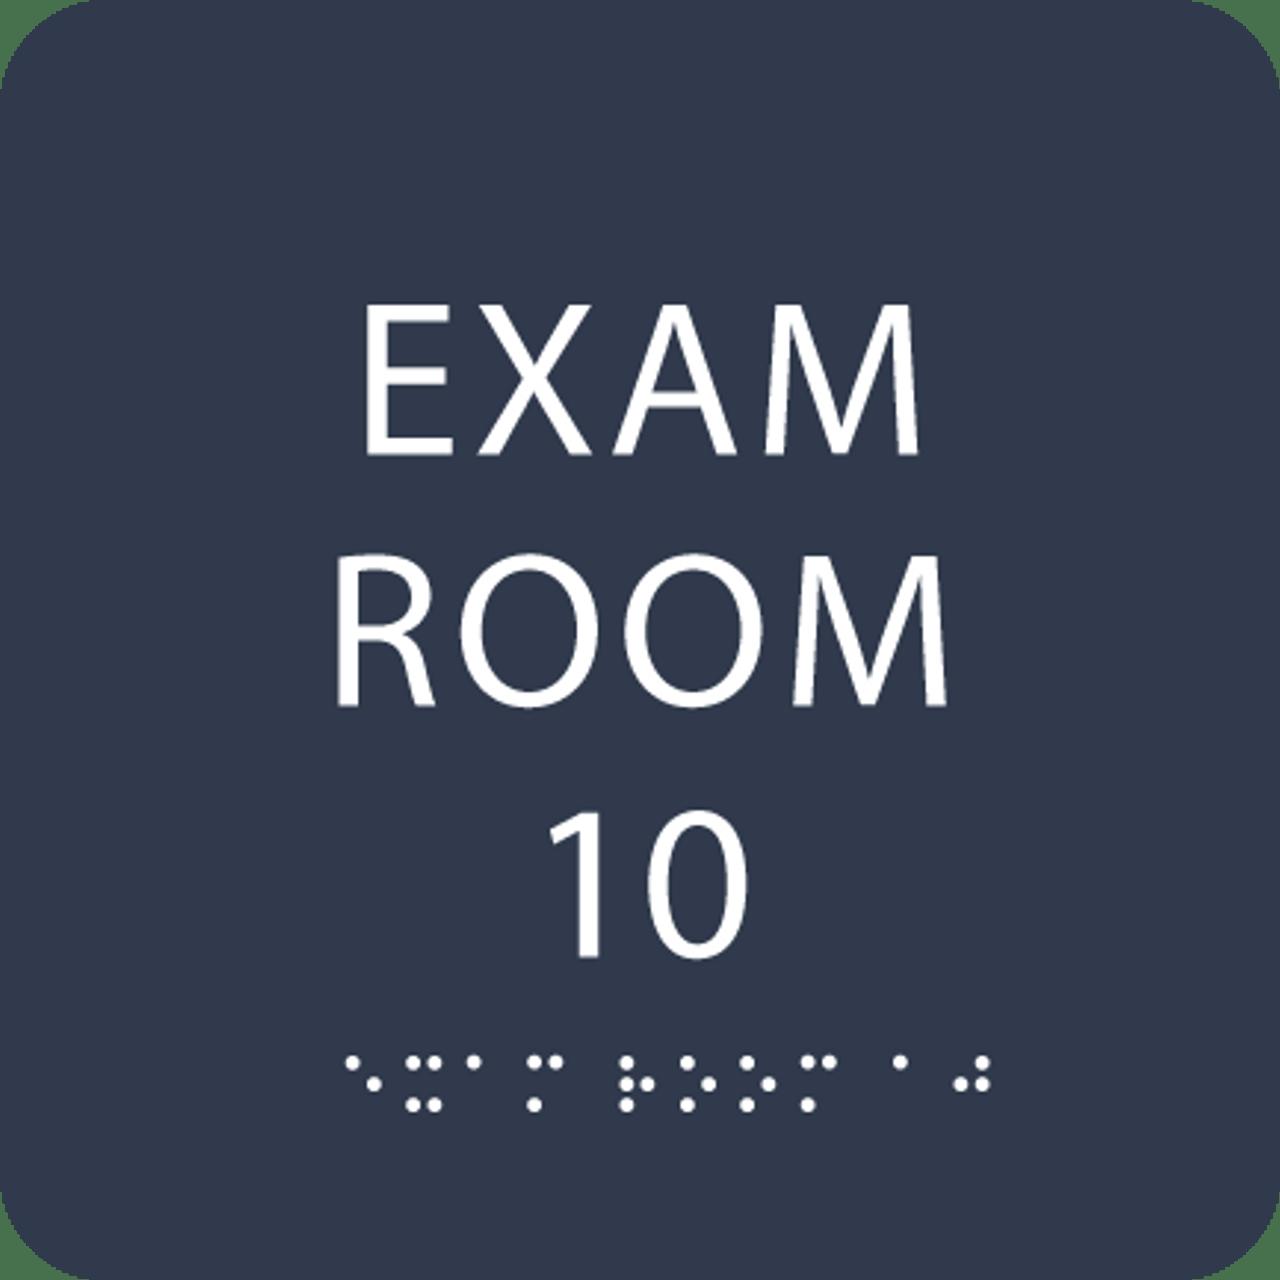 Navy Exam Room 10 Sign w/ ADA Braille